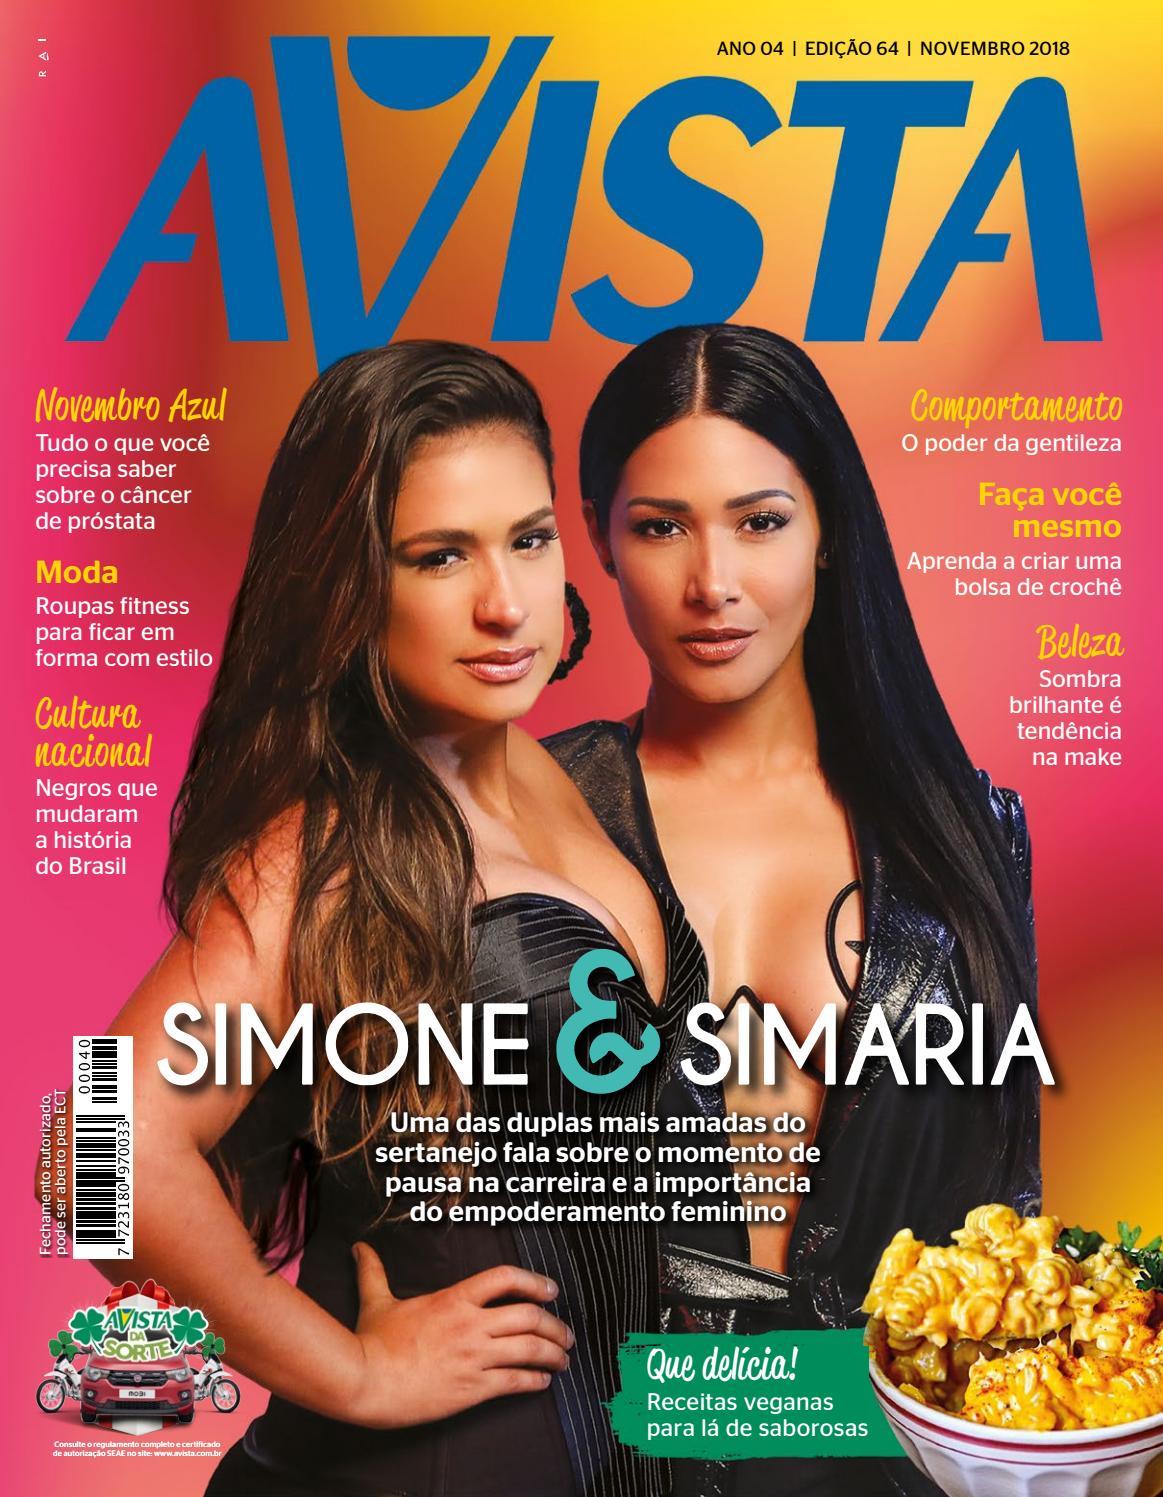 d82744f83c Avista Ed. 64 by Paulo Albergaria - issuu